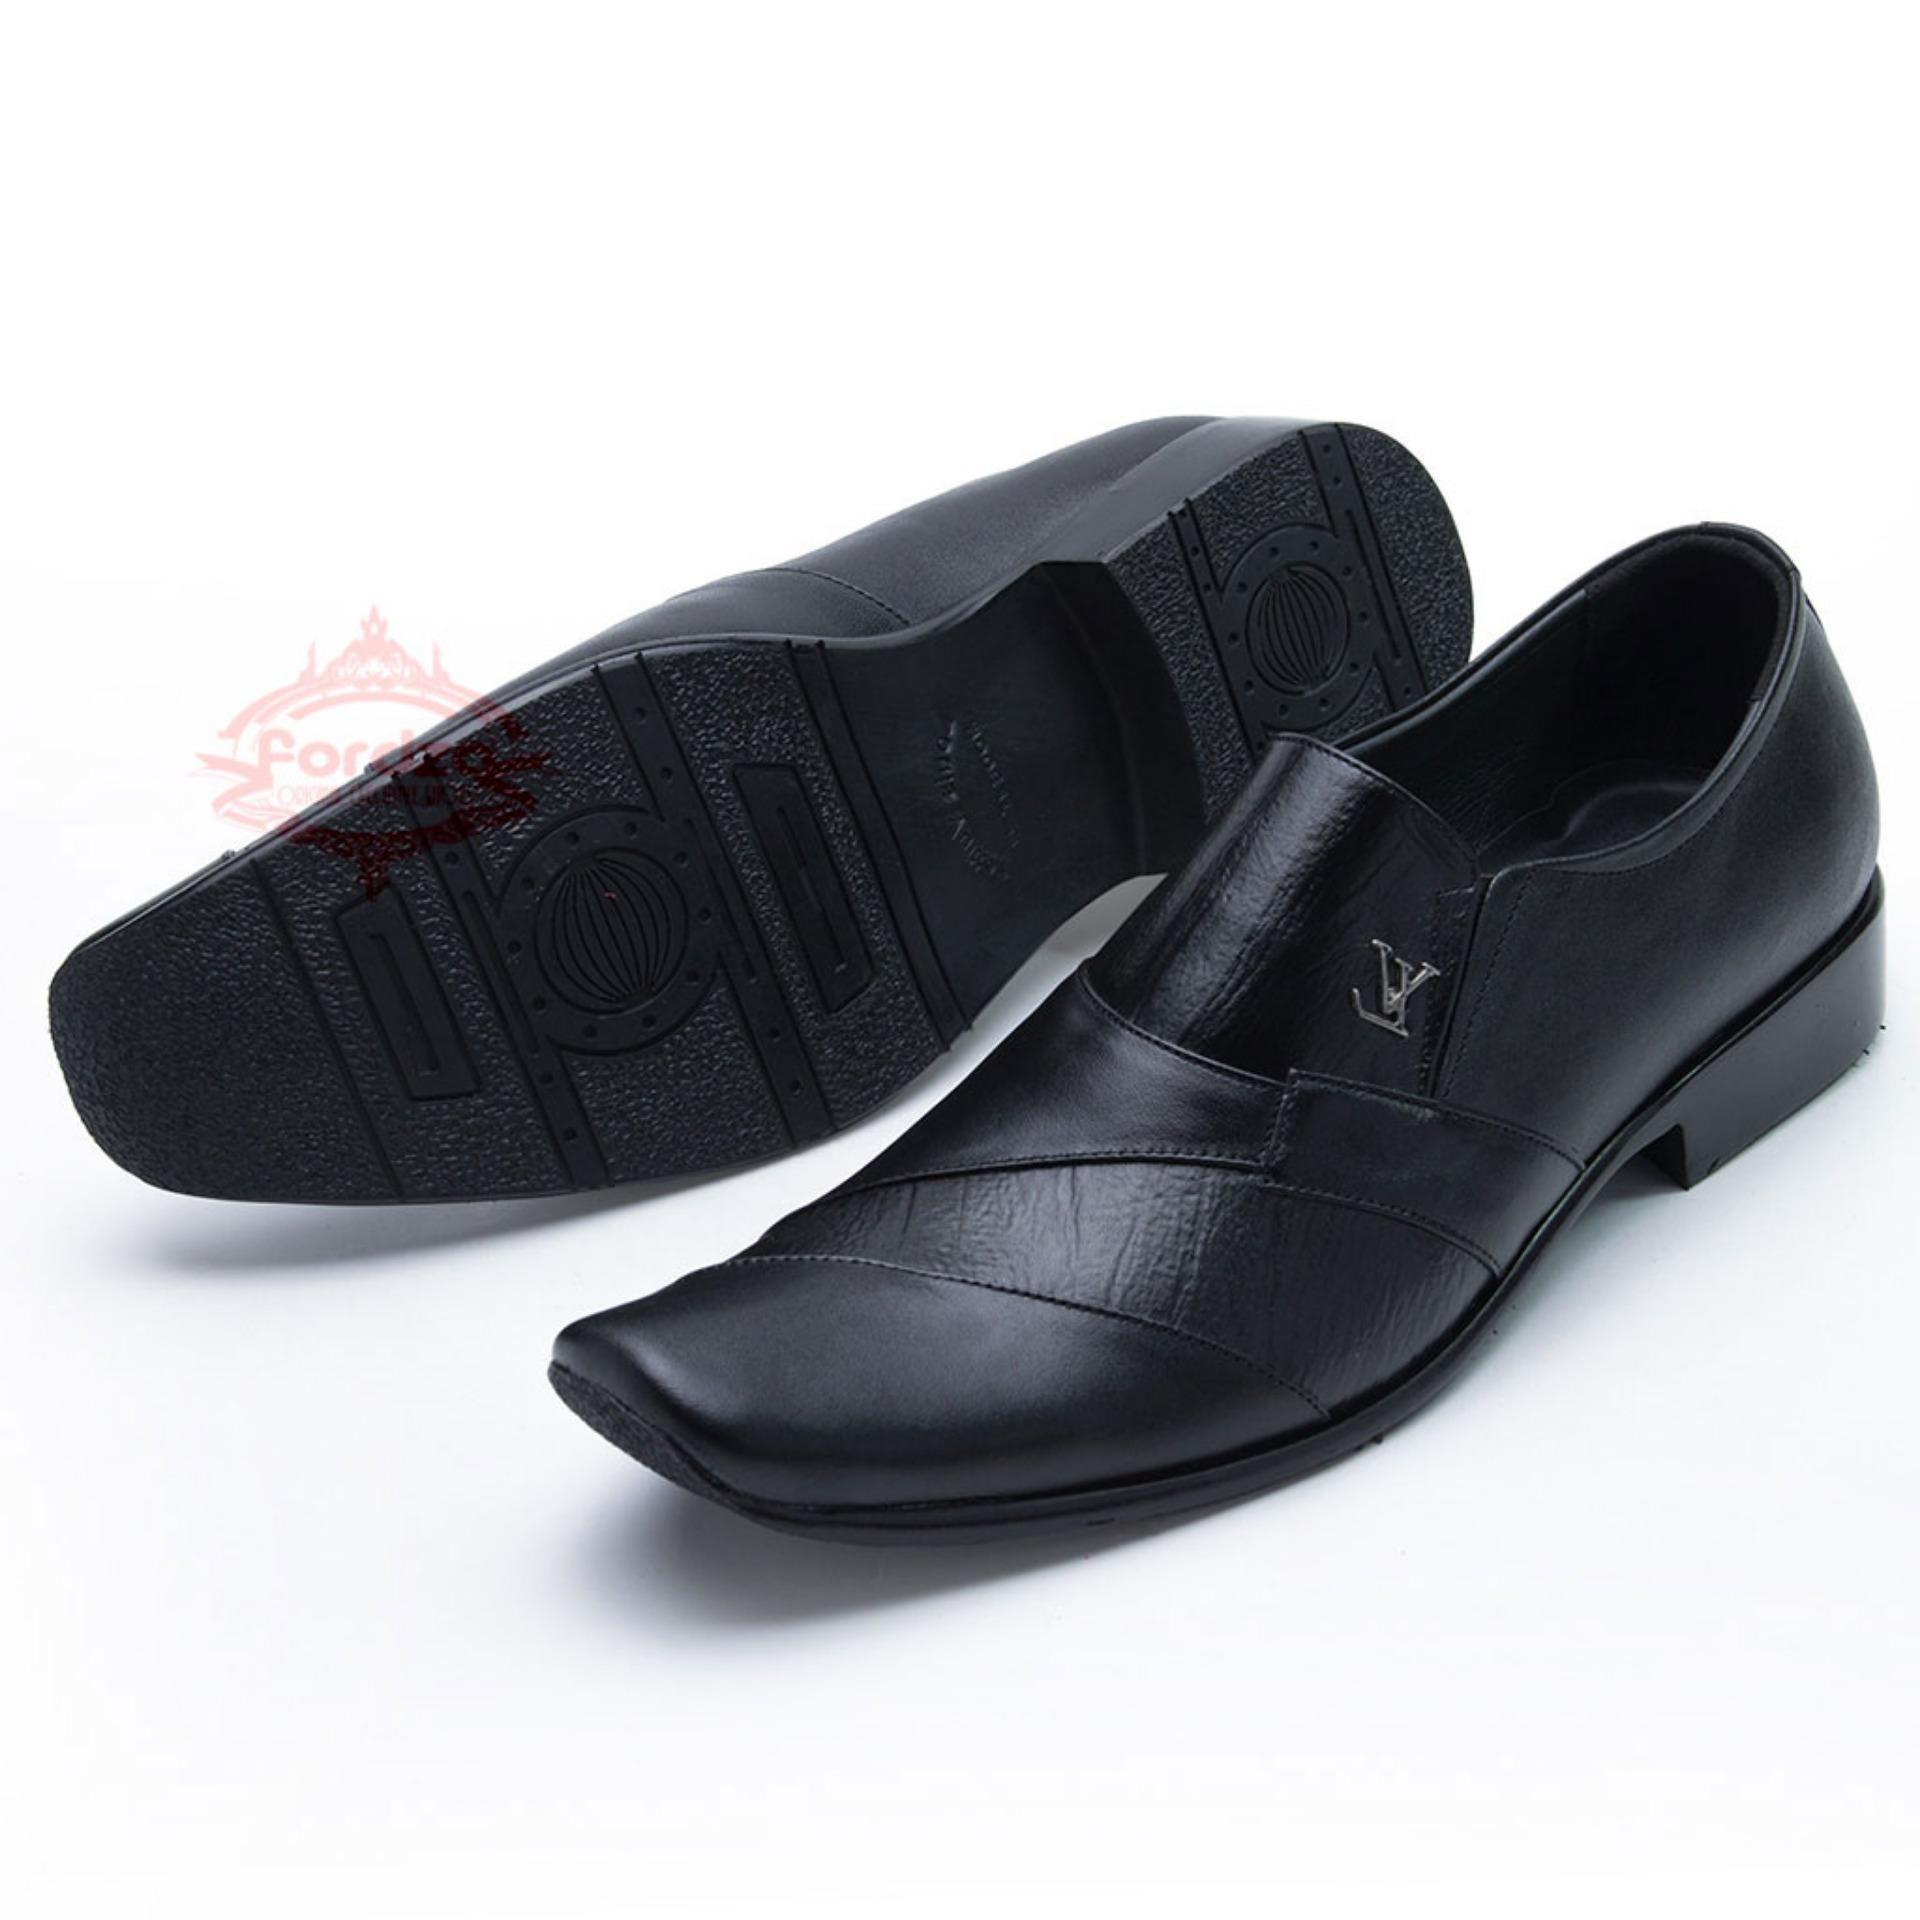 Sepatu Kulit Pantofel Kantor Kerja Bahan Kulit Asli 902HT 0157f9a2a7